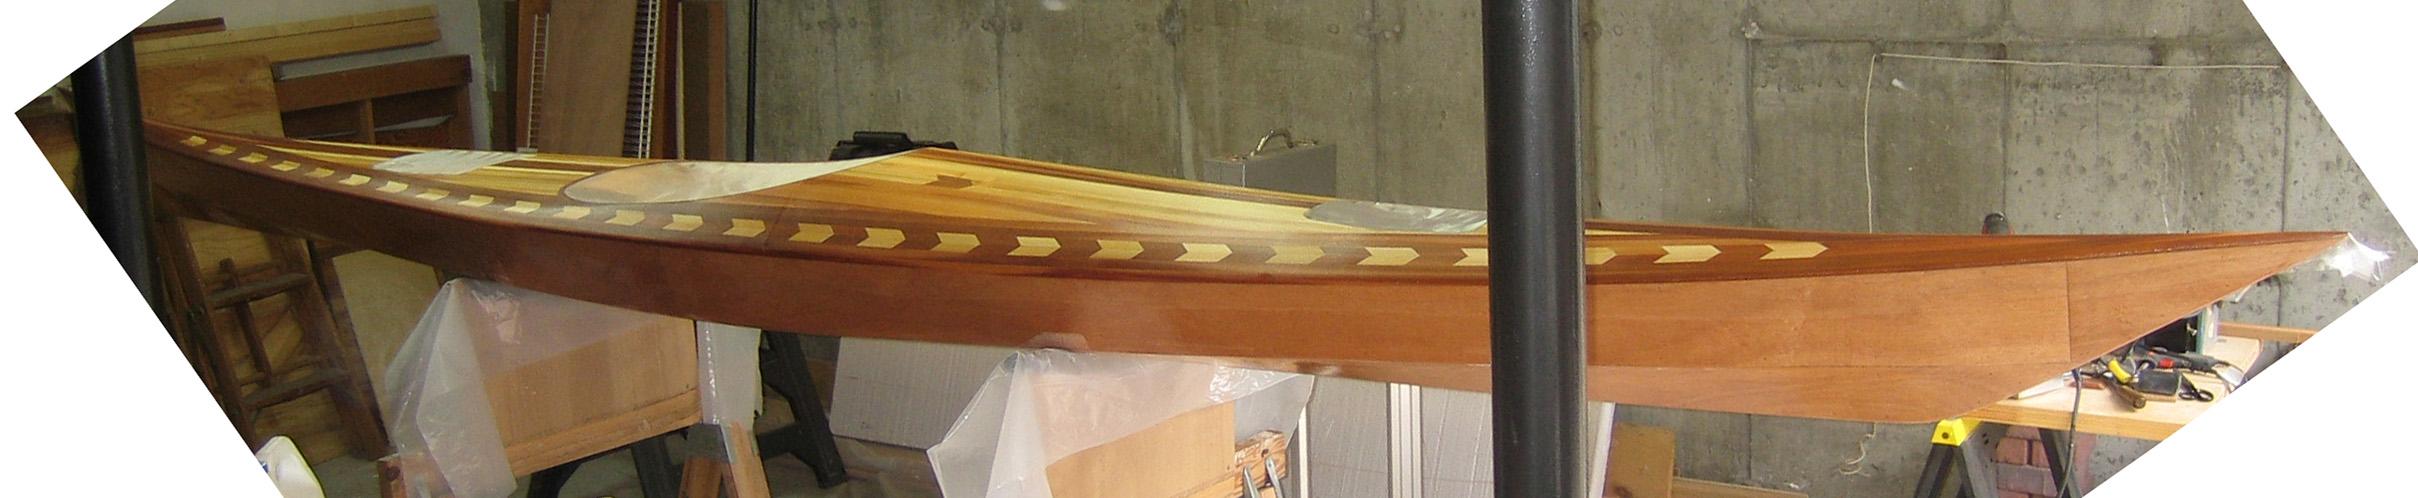 Deck Glassed